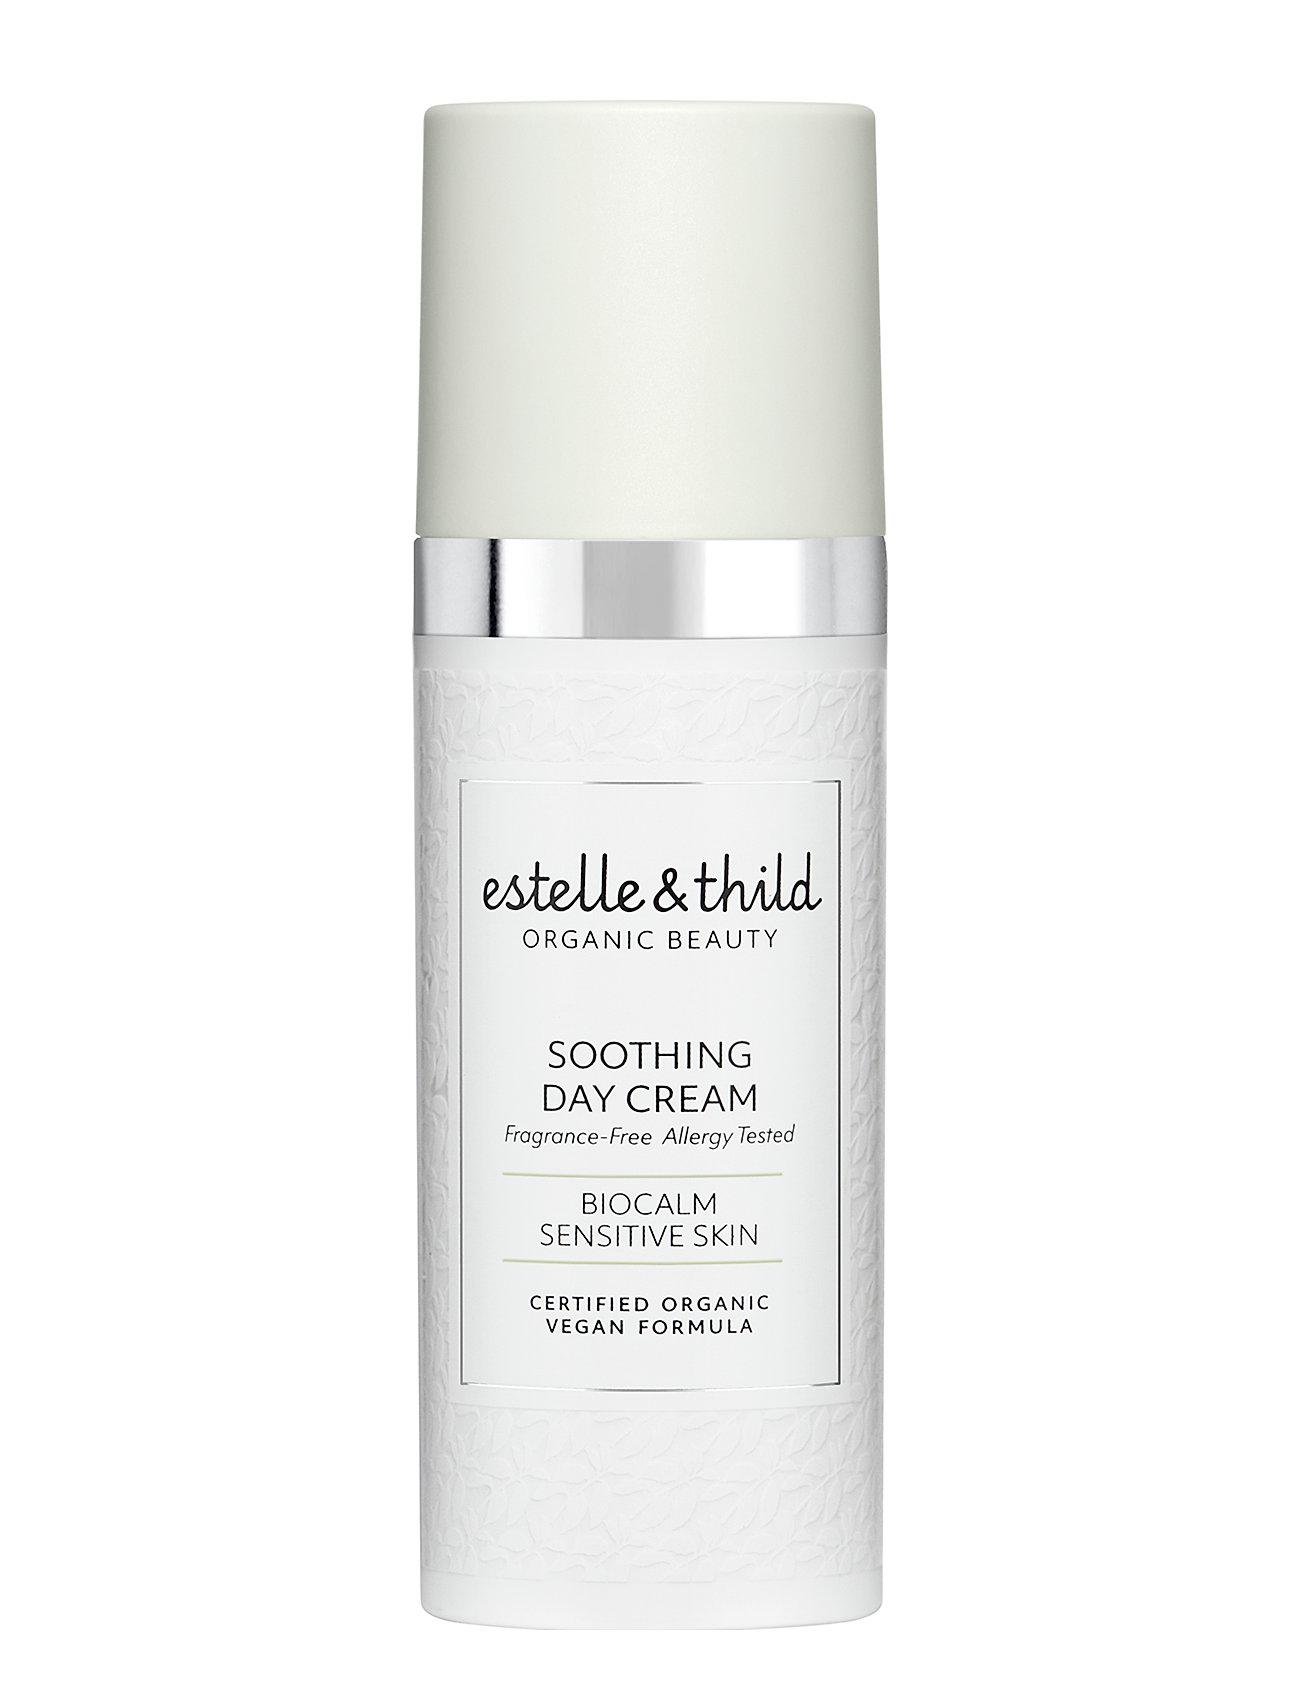 Biocalm Soothing Day Cream - Estelle & Thild